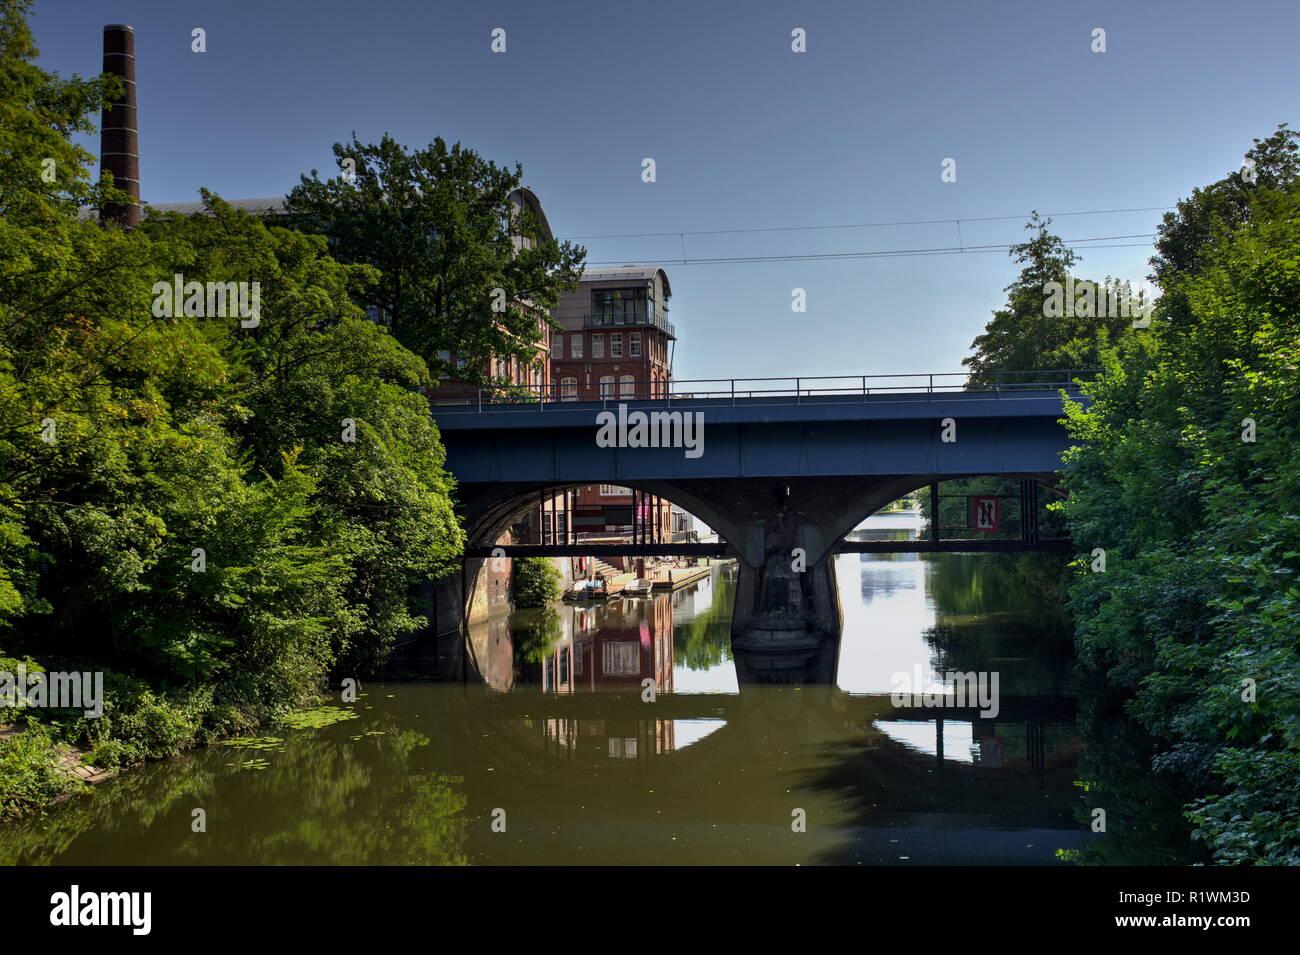 railway bridge in front of a historic chocolate factory in Hamburg - Stock Image